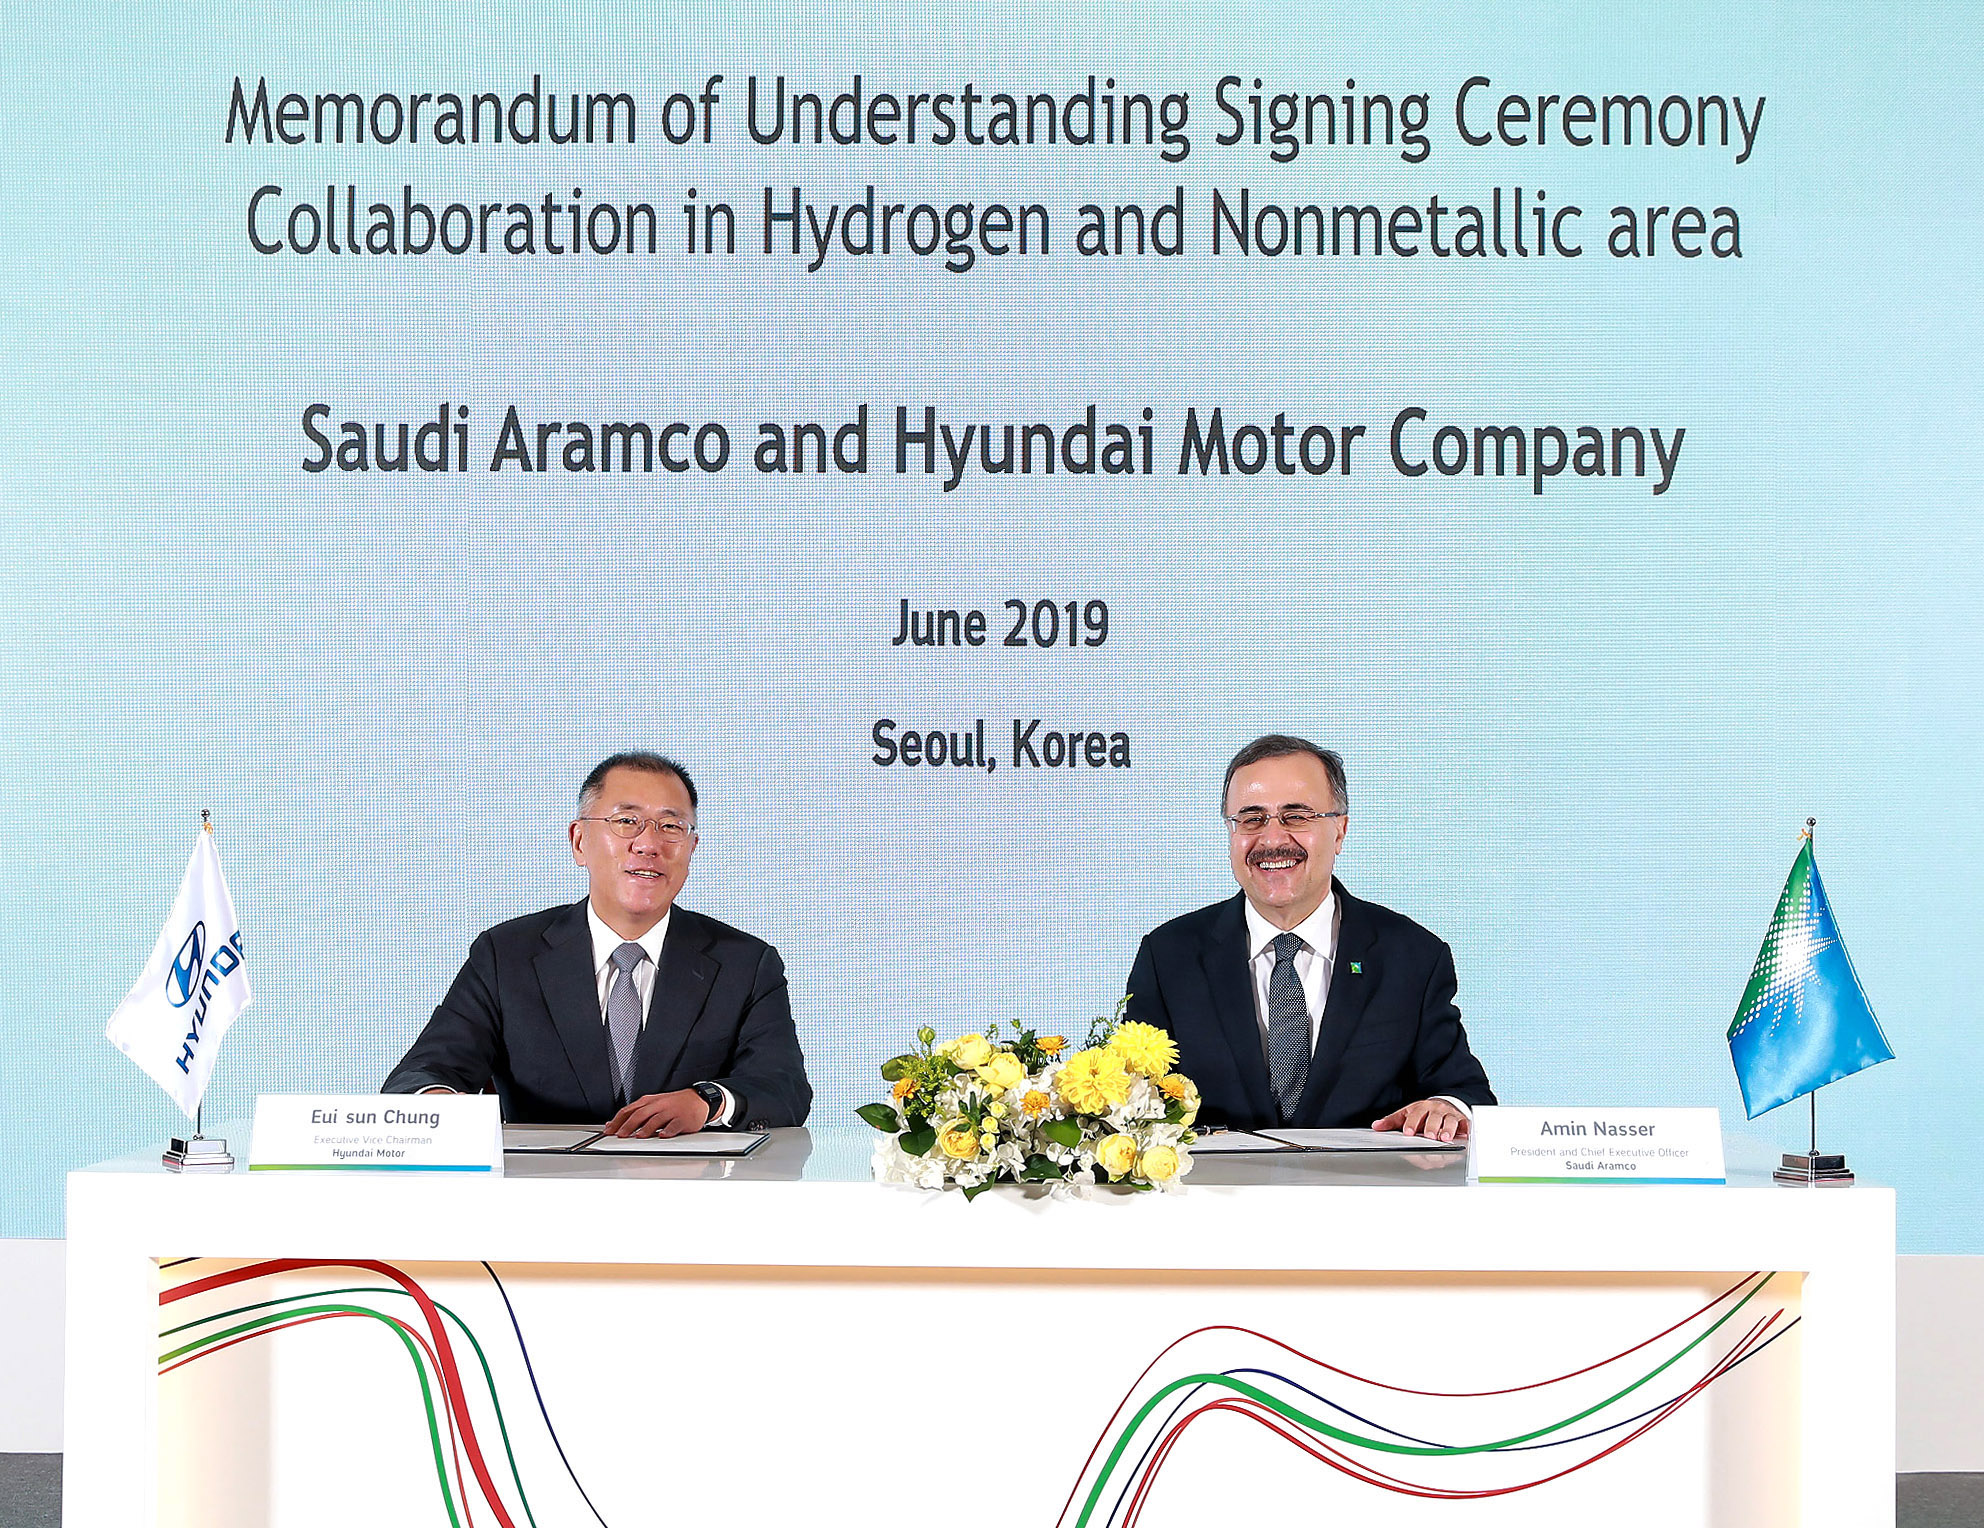 Hyundai and Aramco Sign MOU